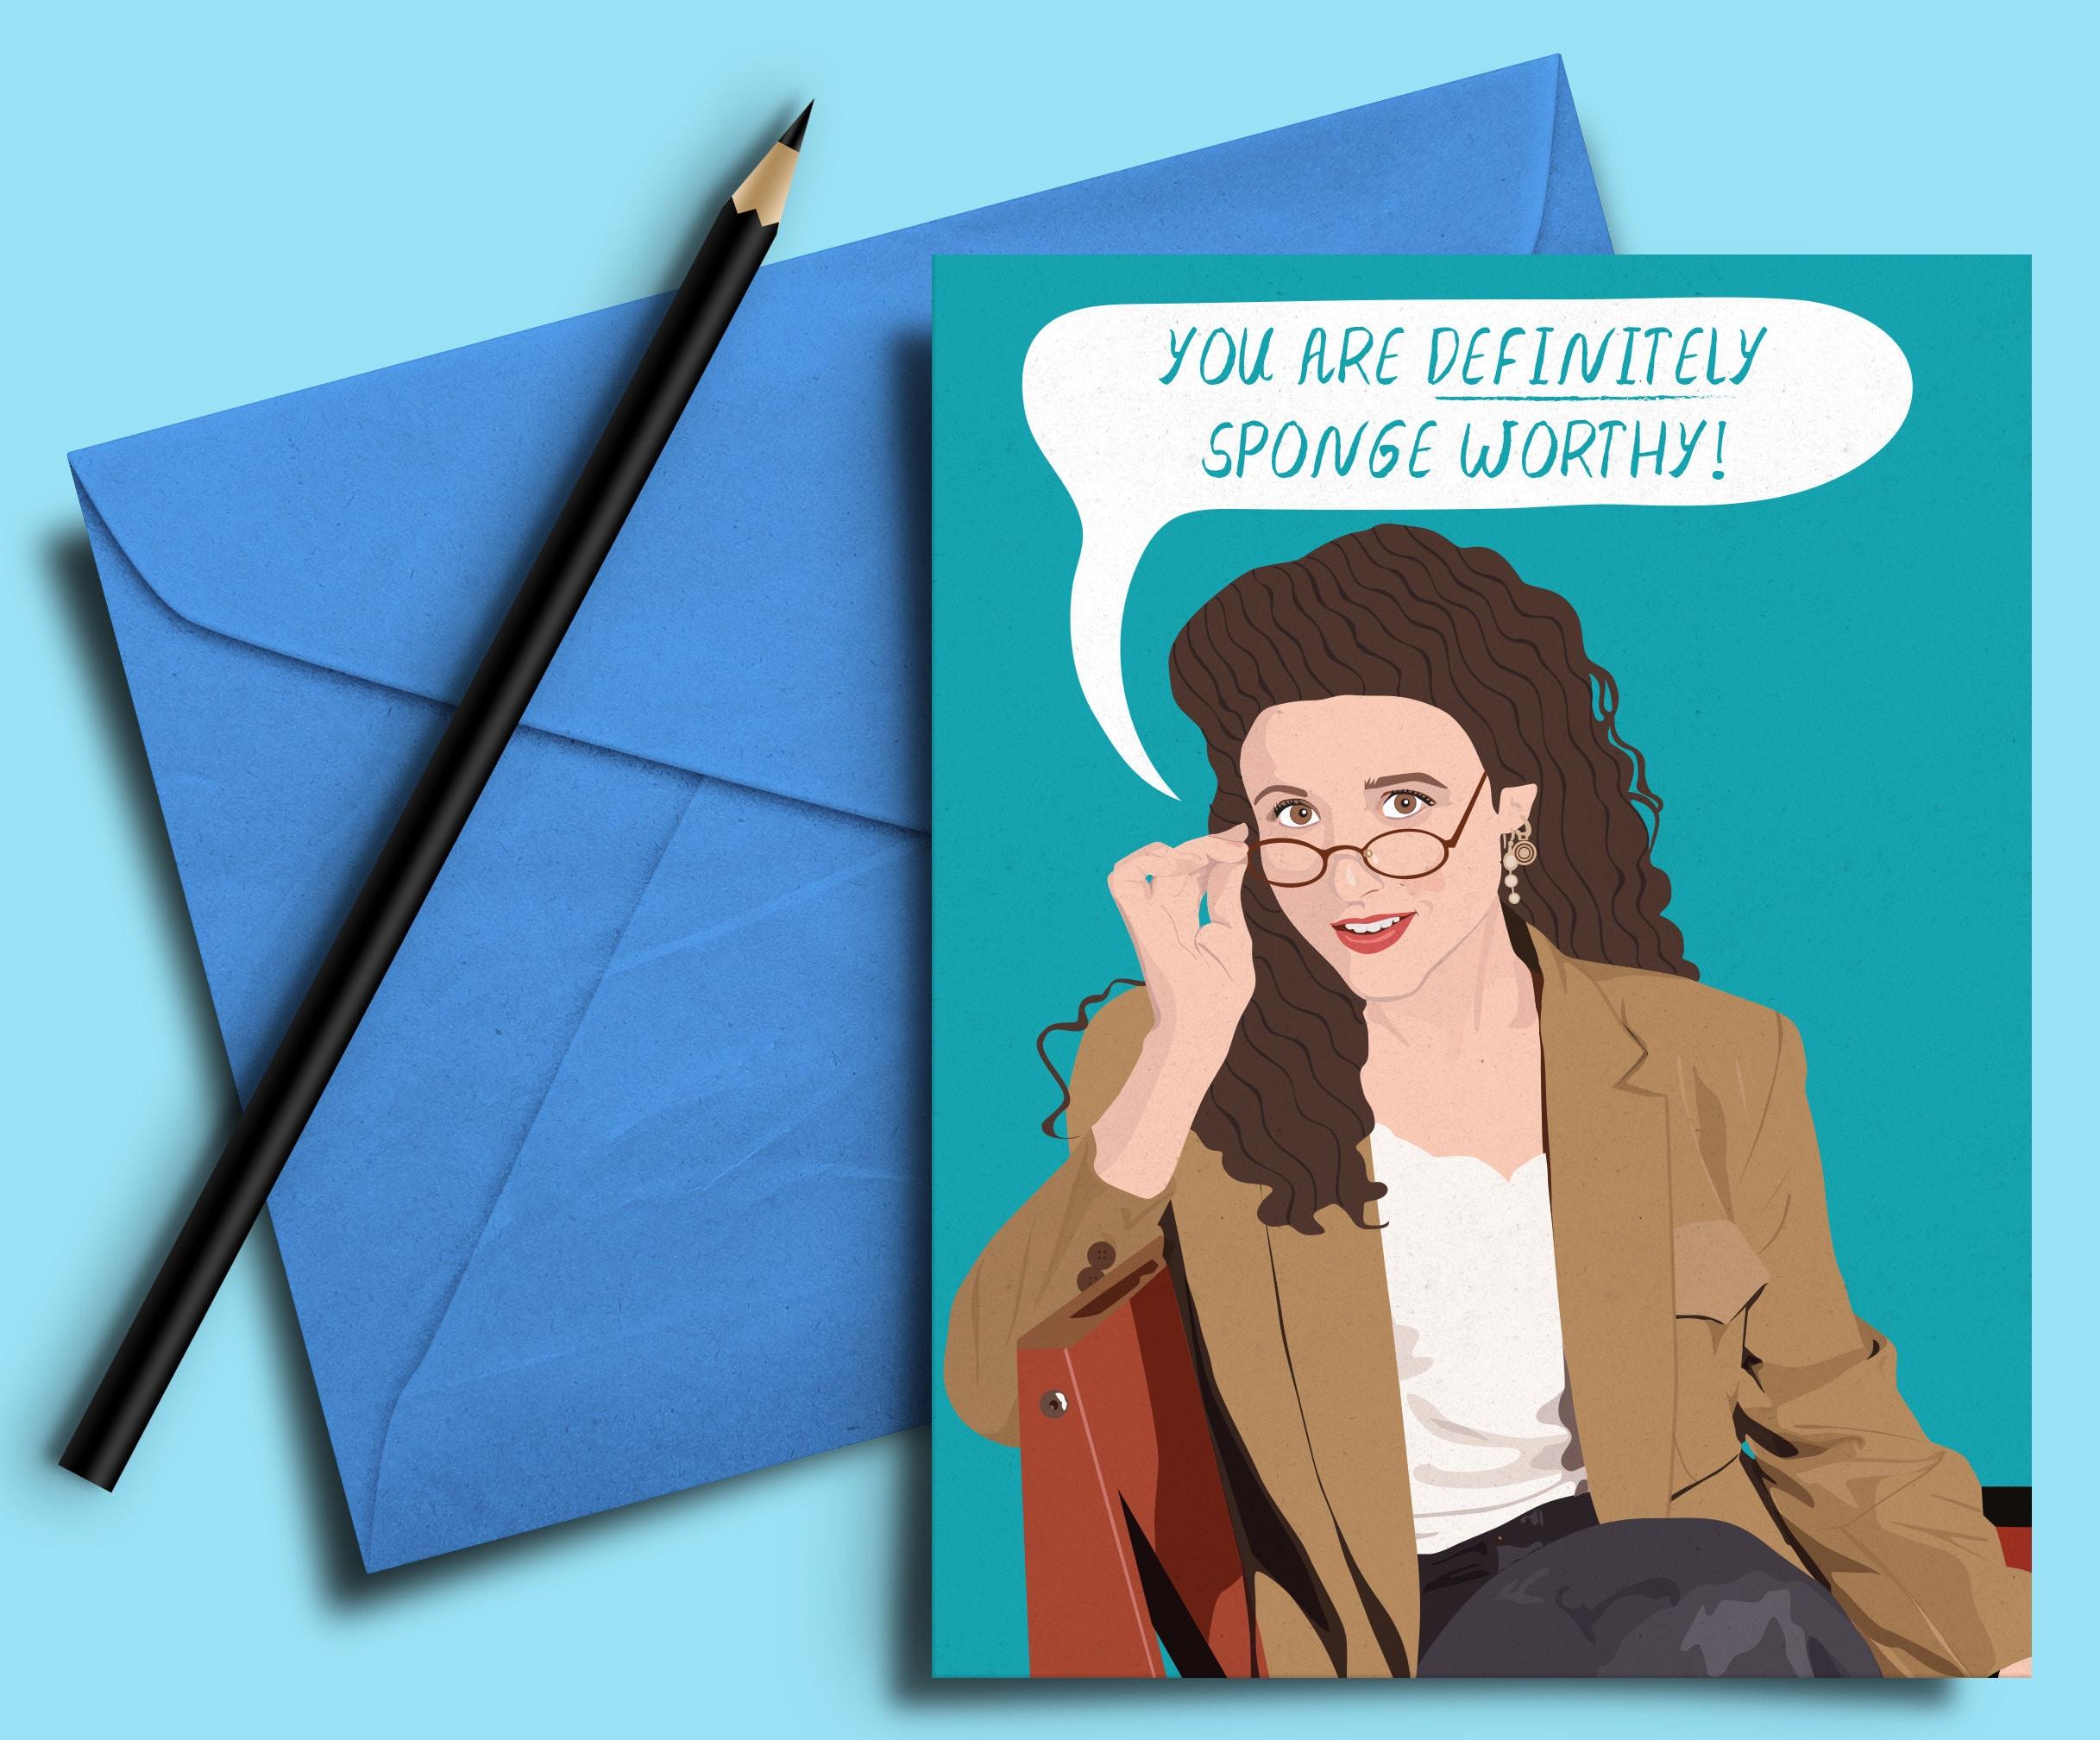 Elaine Seinfeld Spongeworthy Card Funny Greeting Love Etsy